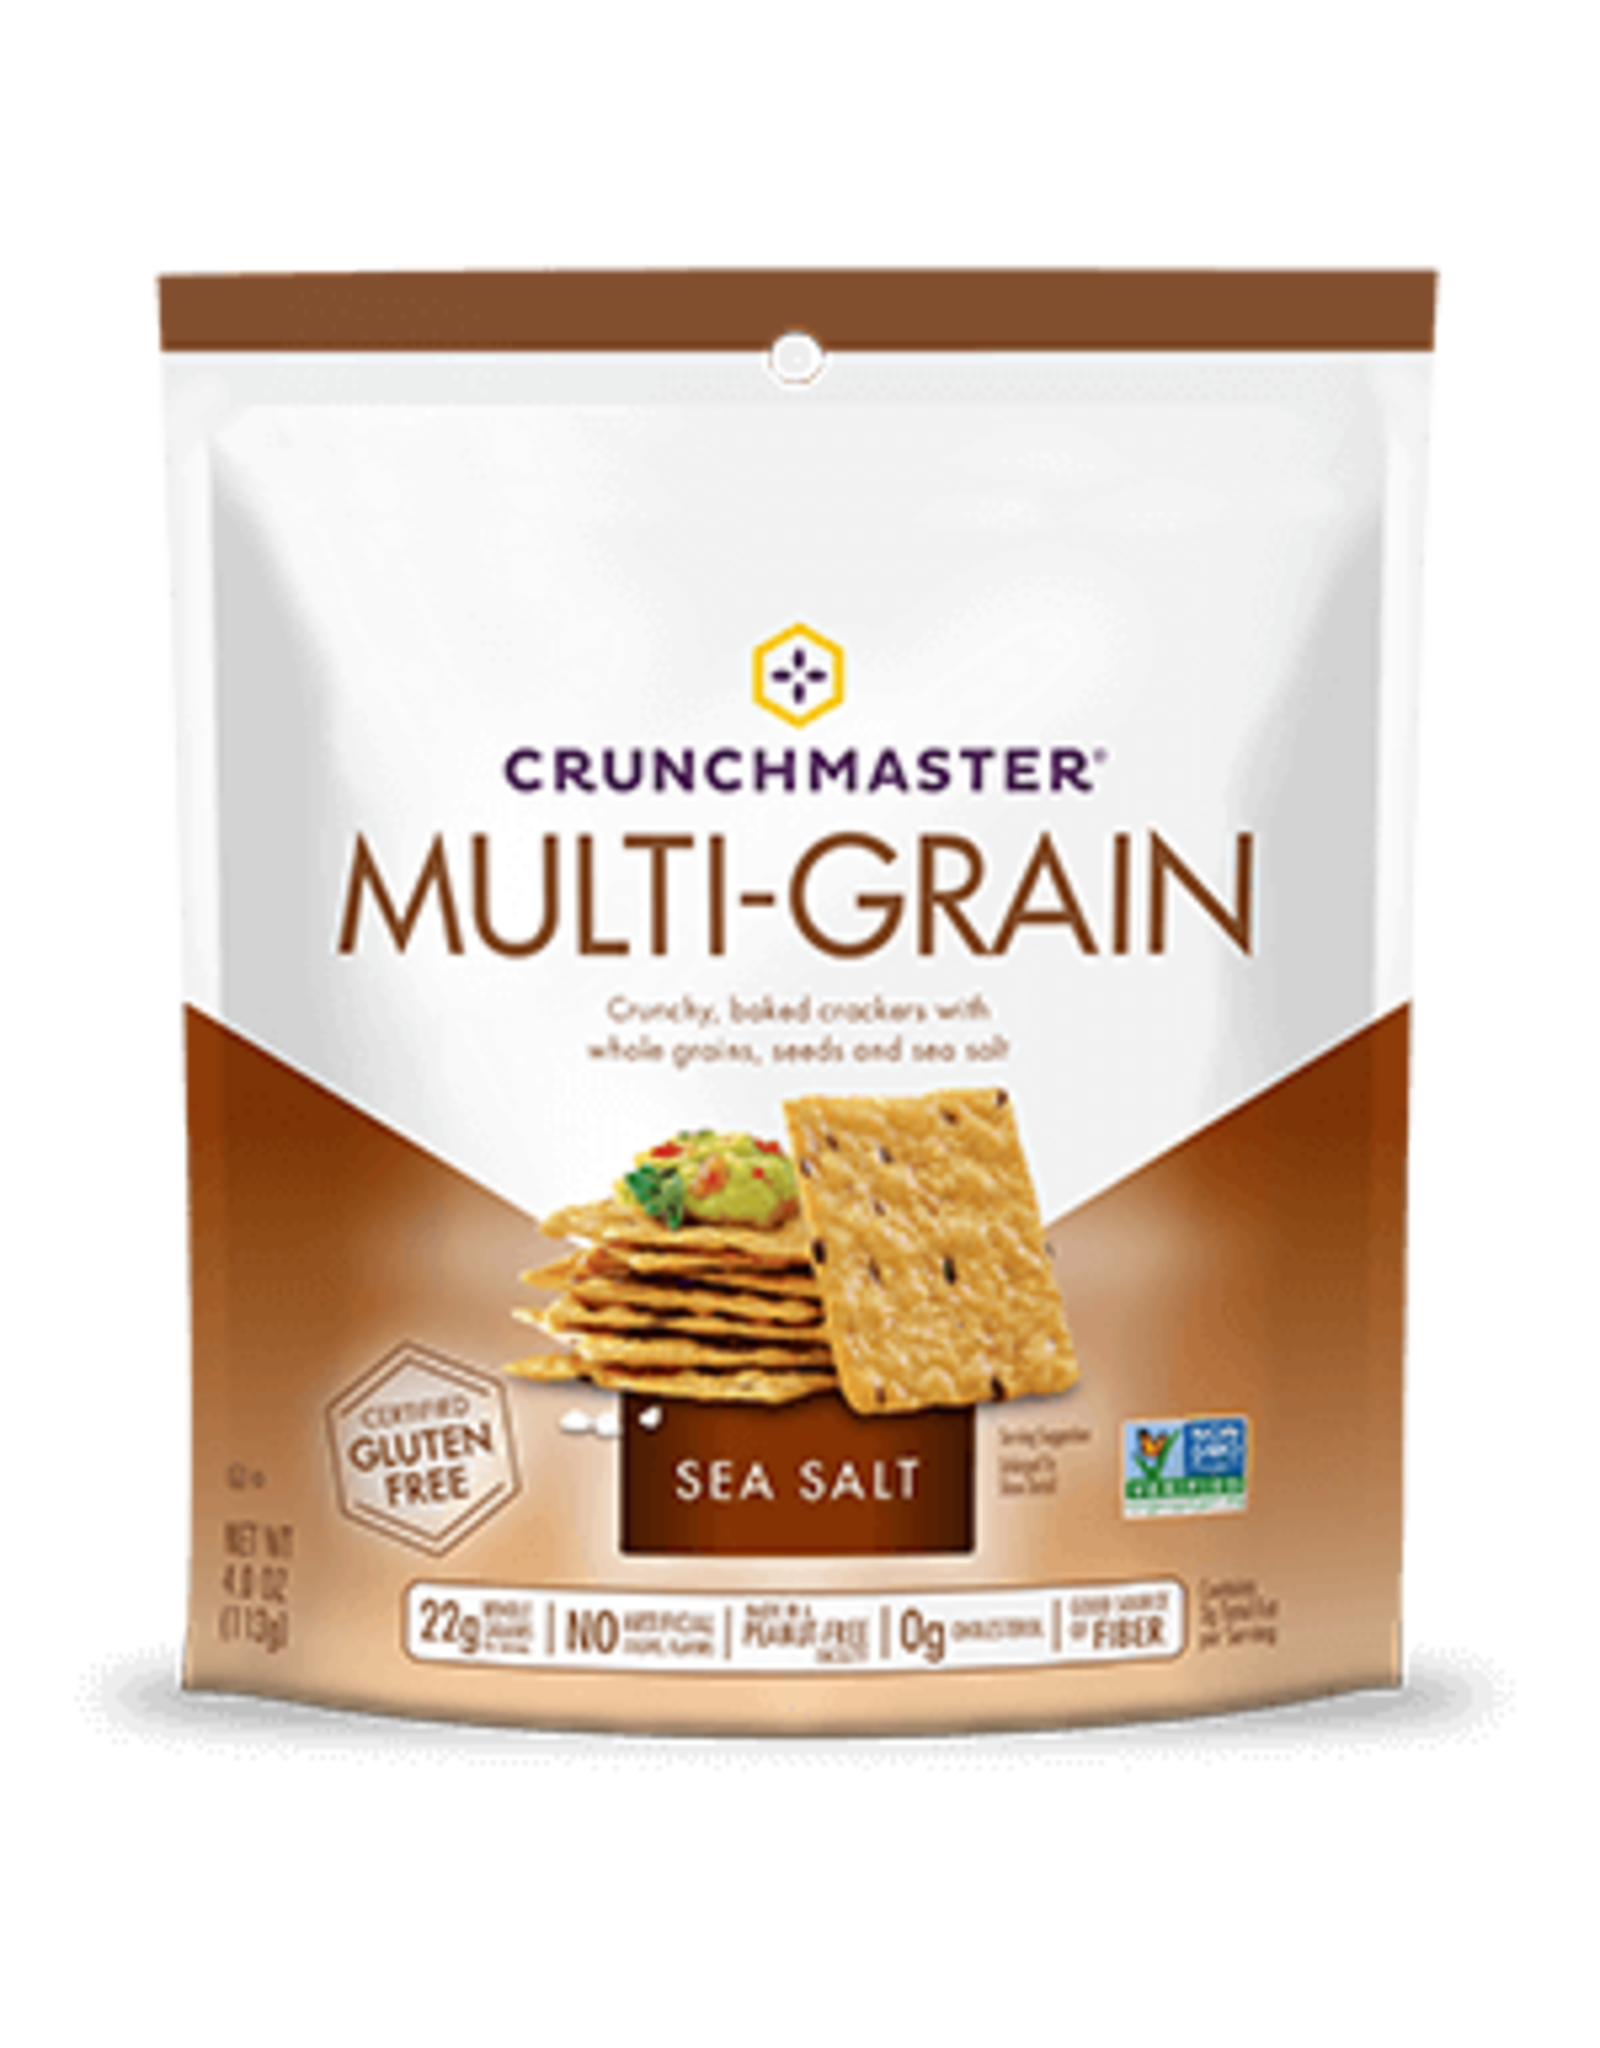 Crunchmaster Crunchmaster Multi-Grain & Sea Salt Gluten Free Crackers